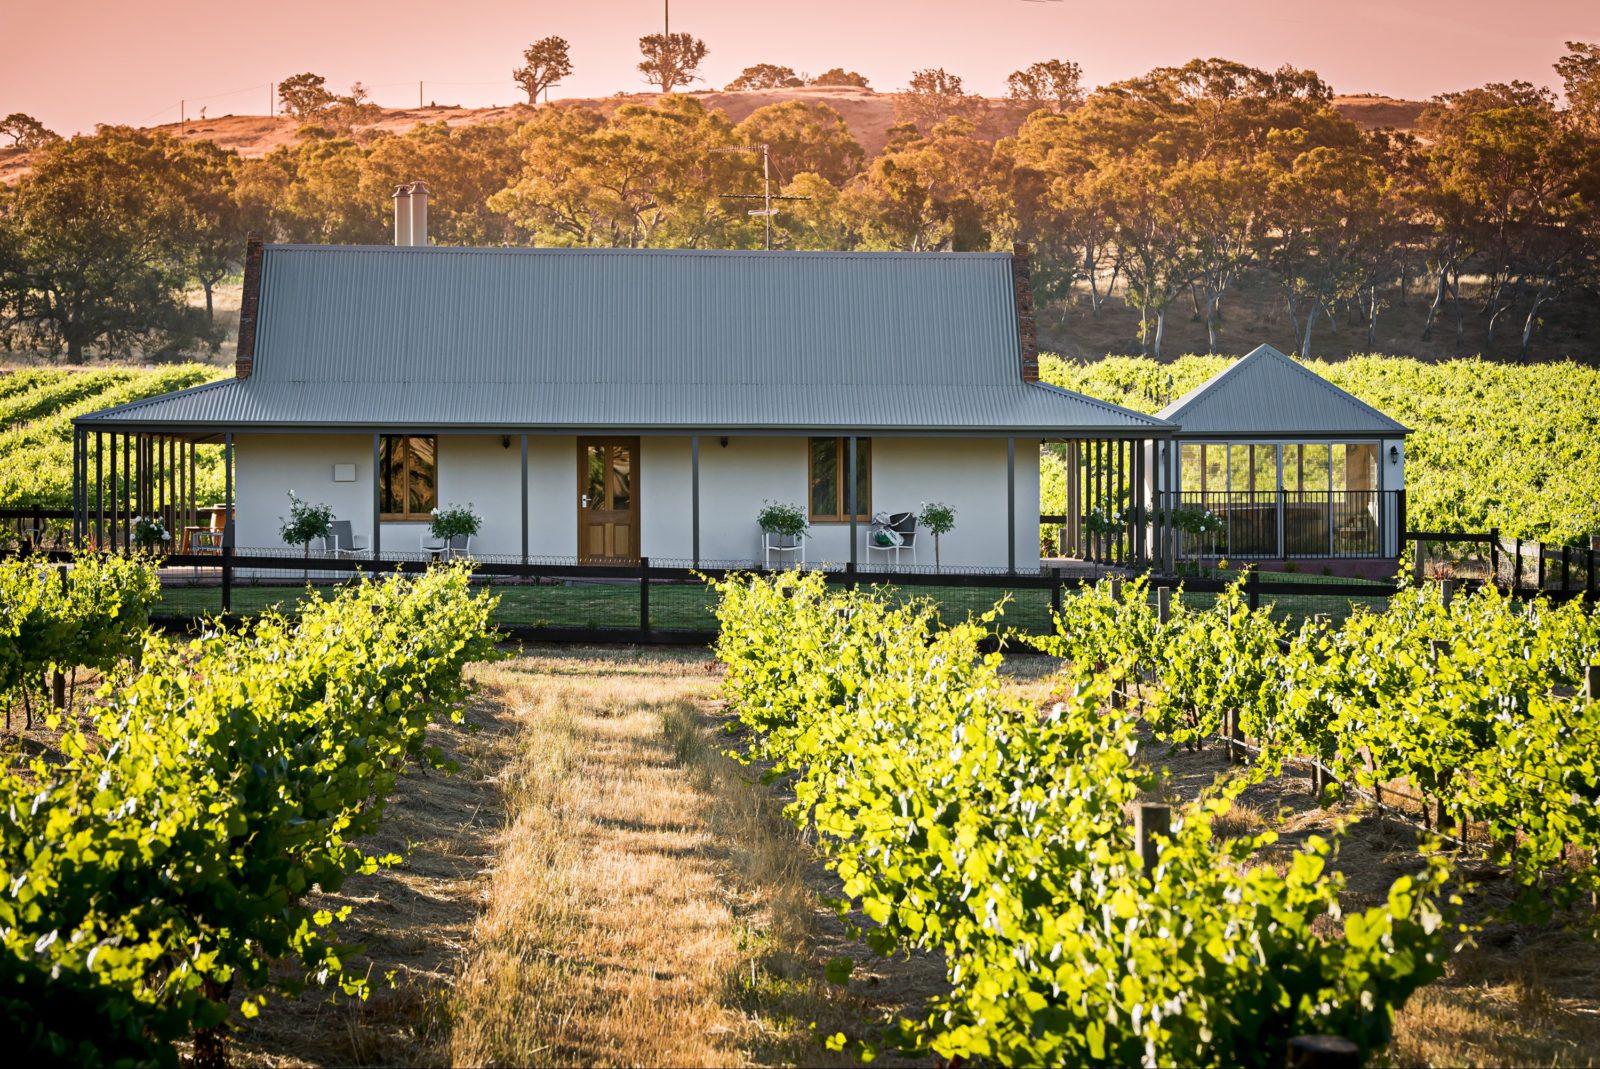 Brockenchack Vineyard Bed & Breakfast is set amongst the vines in Eden Valley